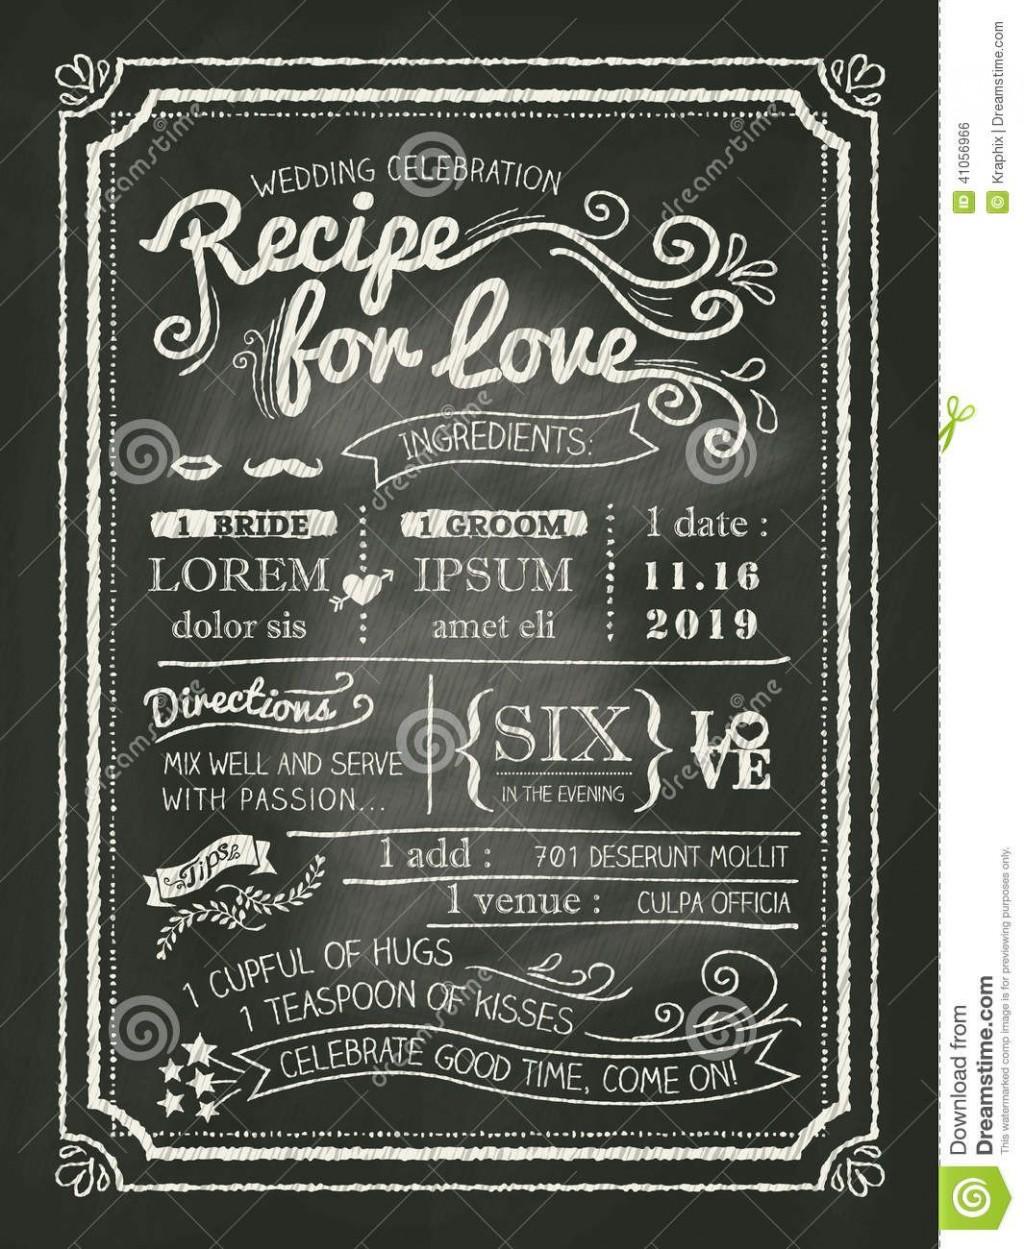 008 Amazing Chalkboard Invitation Template Free Design  Download Wedding EditableLarge